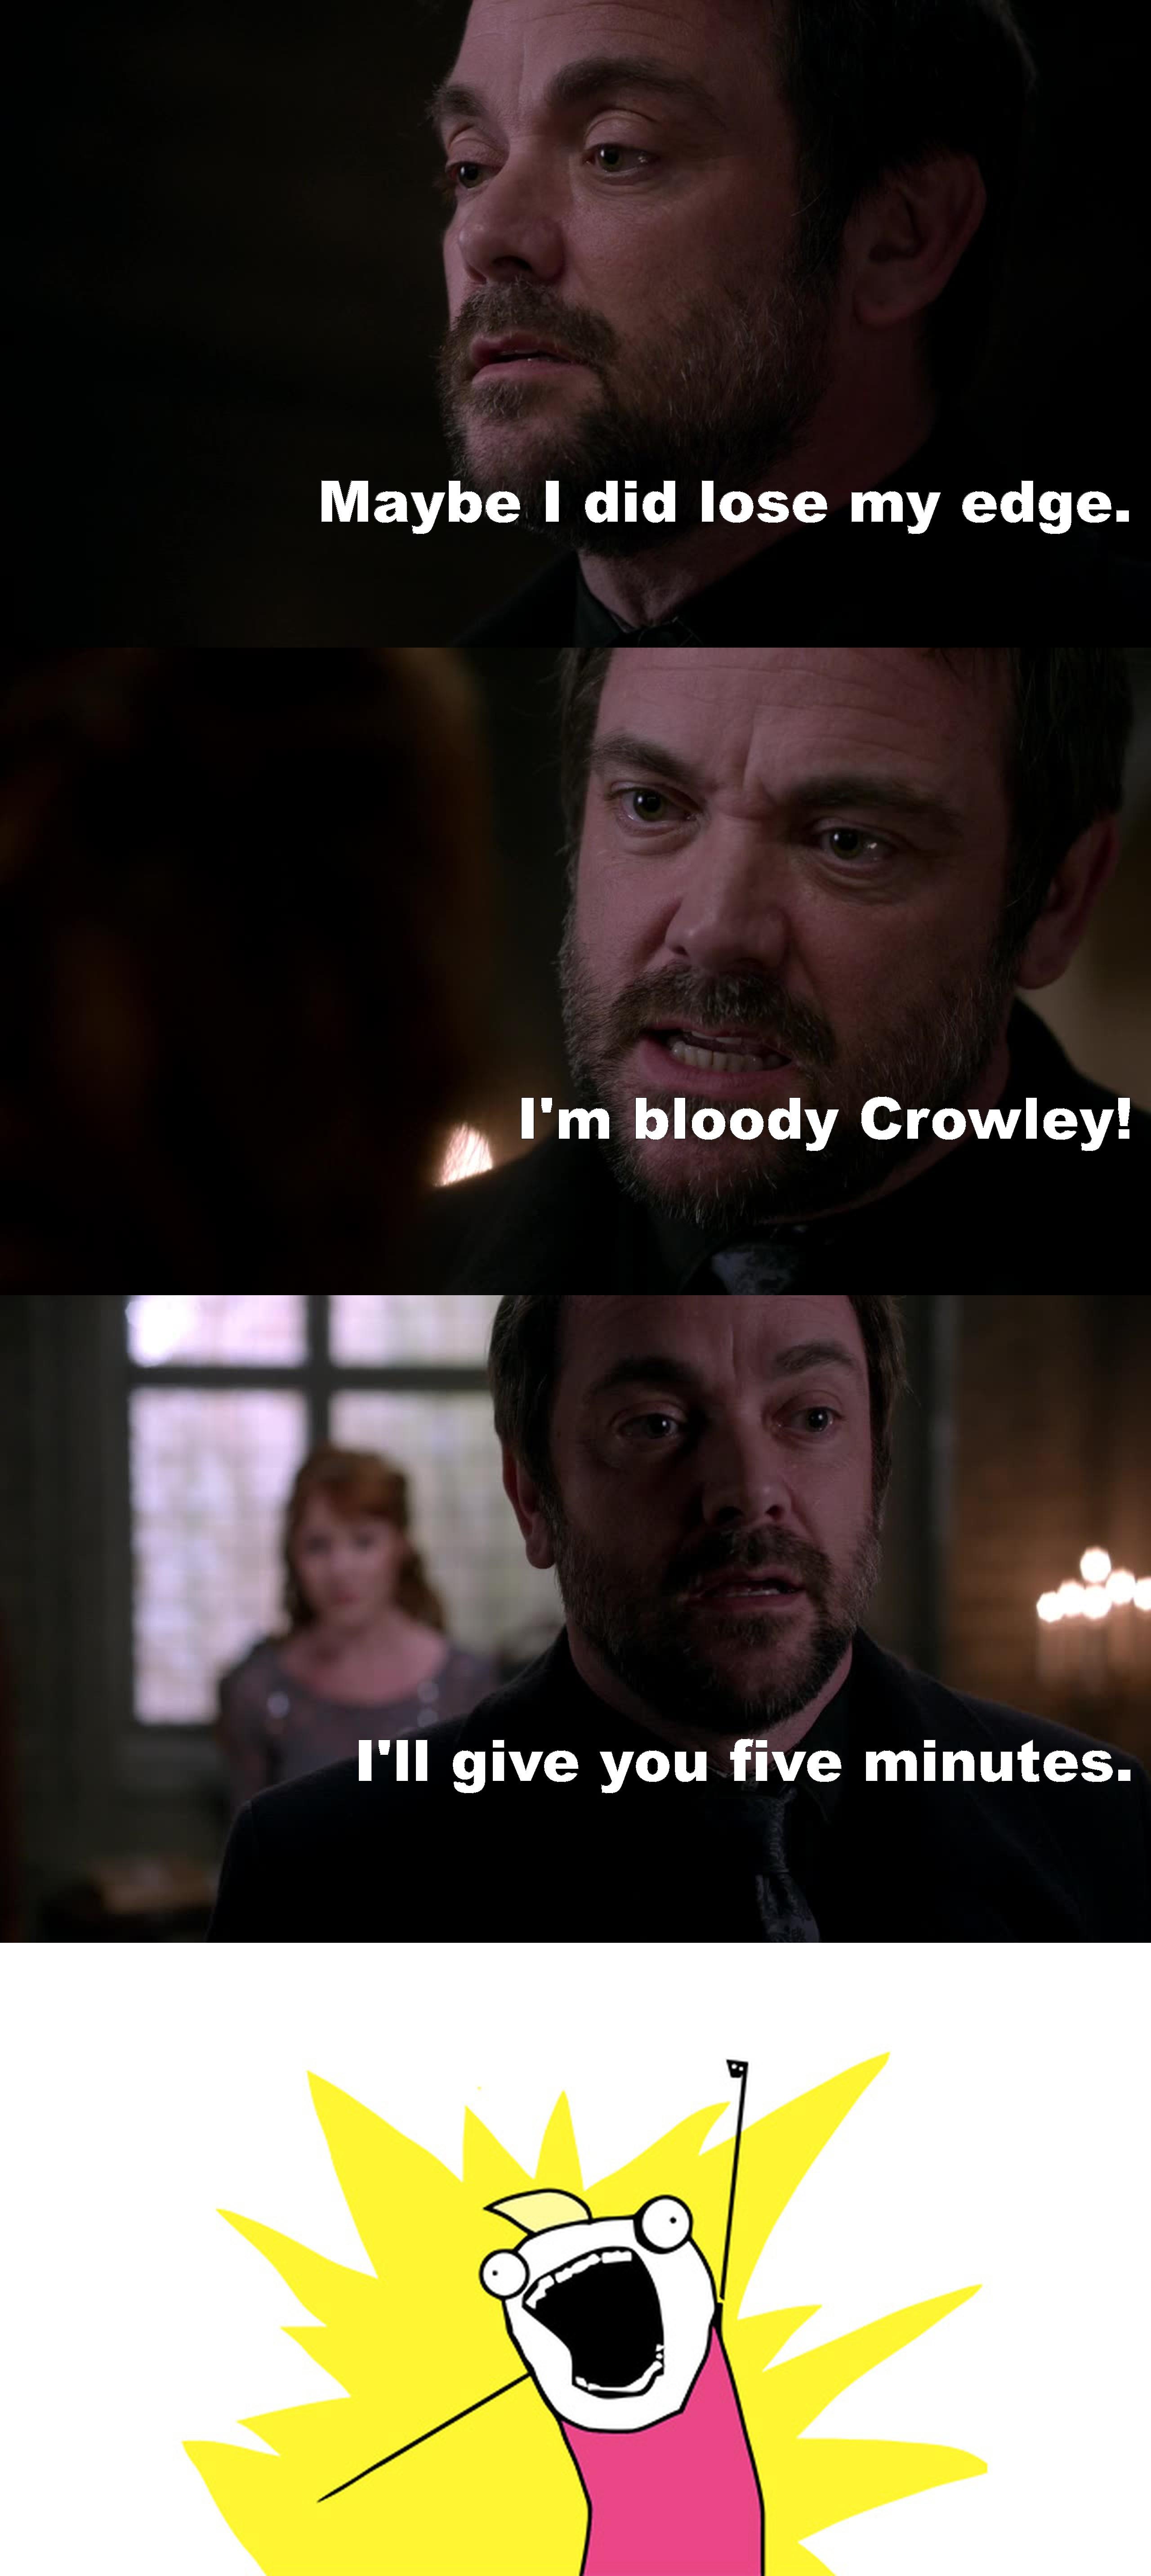 Badass Crowley is the best Crowley